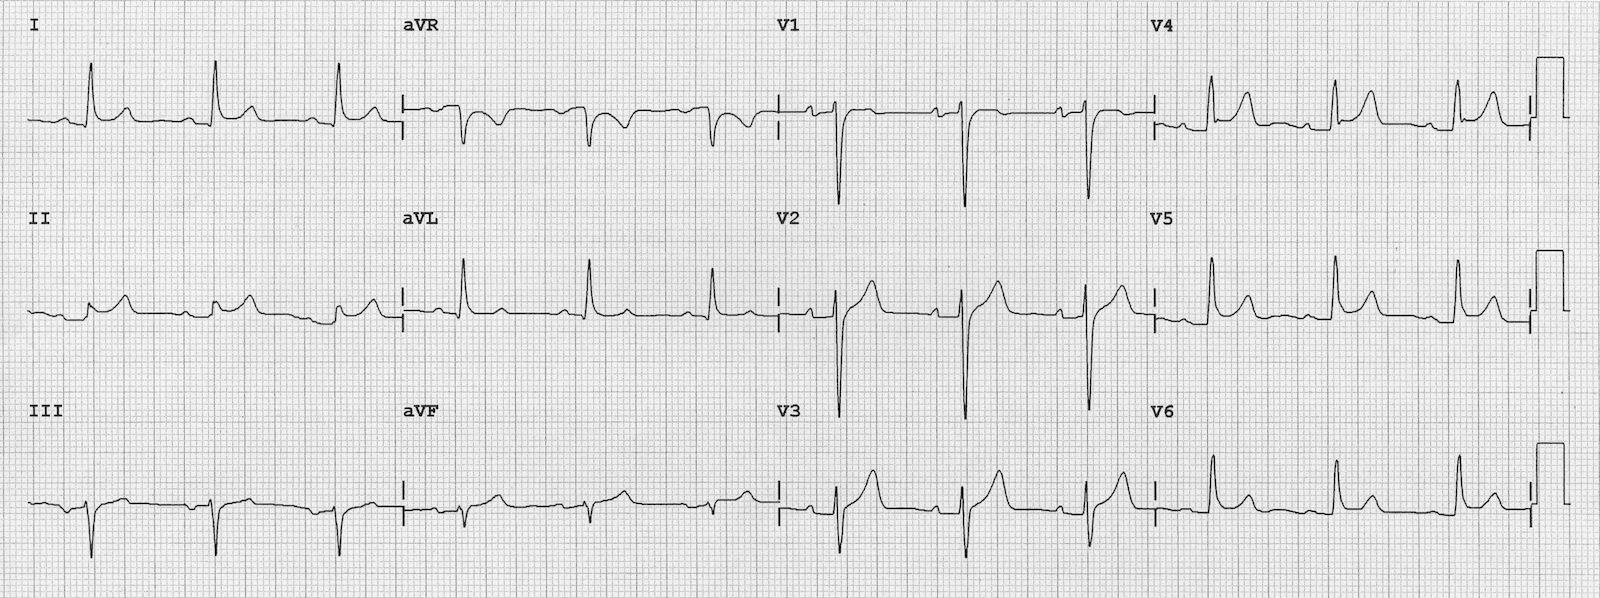 Akut perikarditte tipik EKG Kaynak: lifeinthefastlane.com - ecg